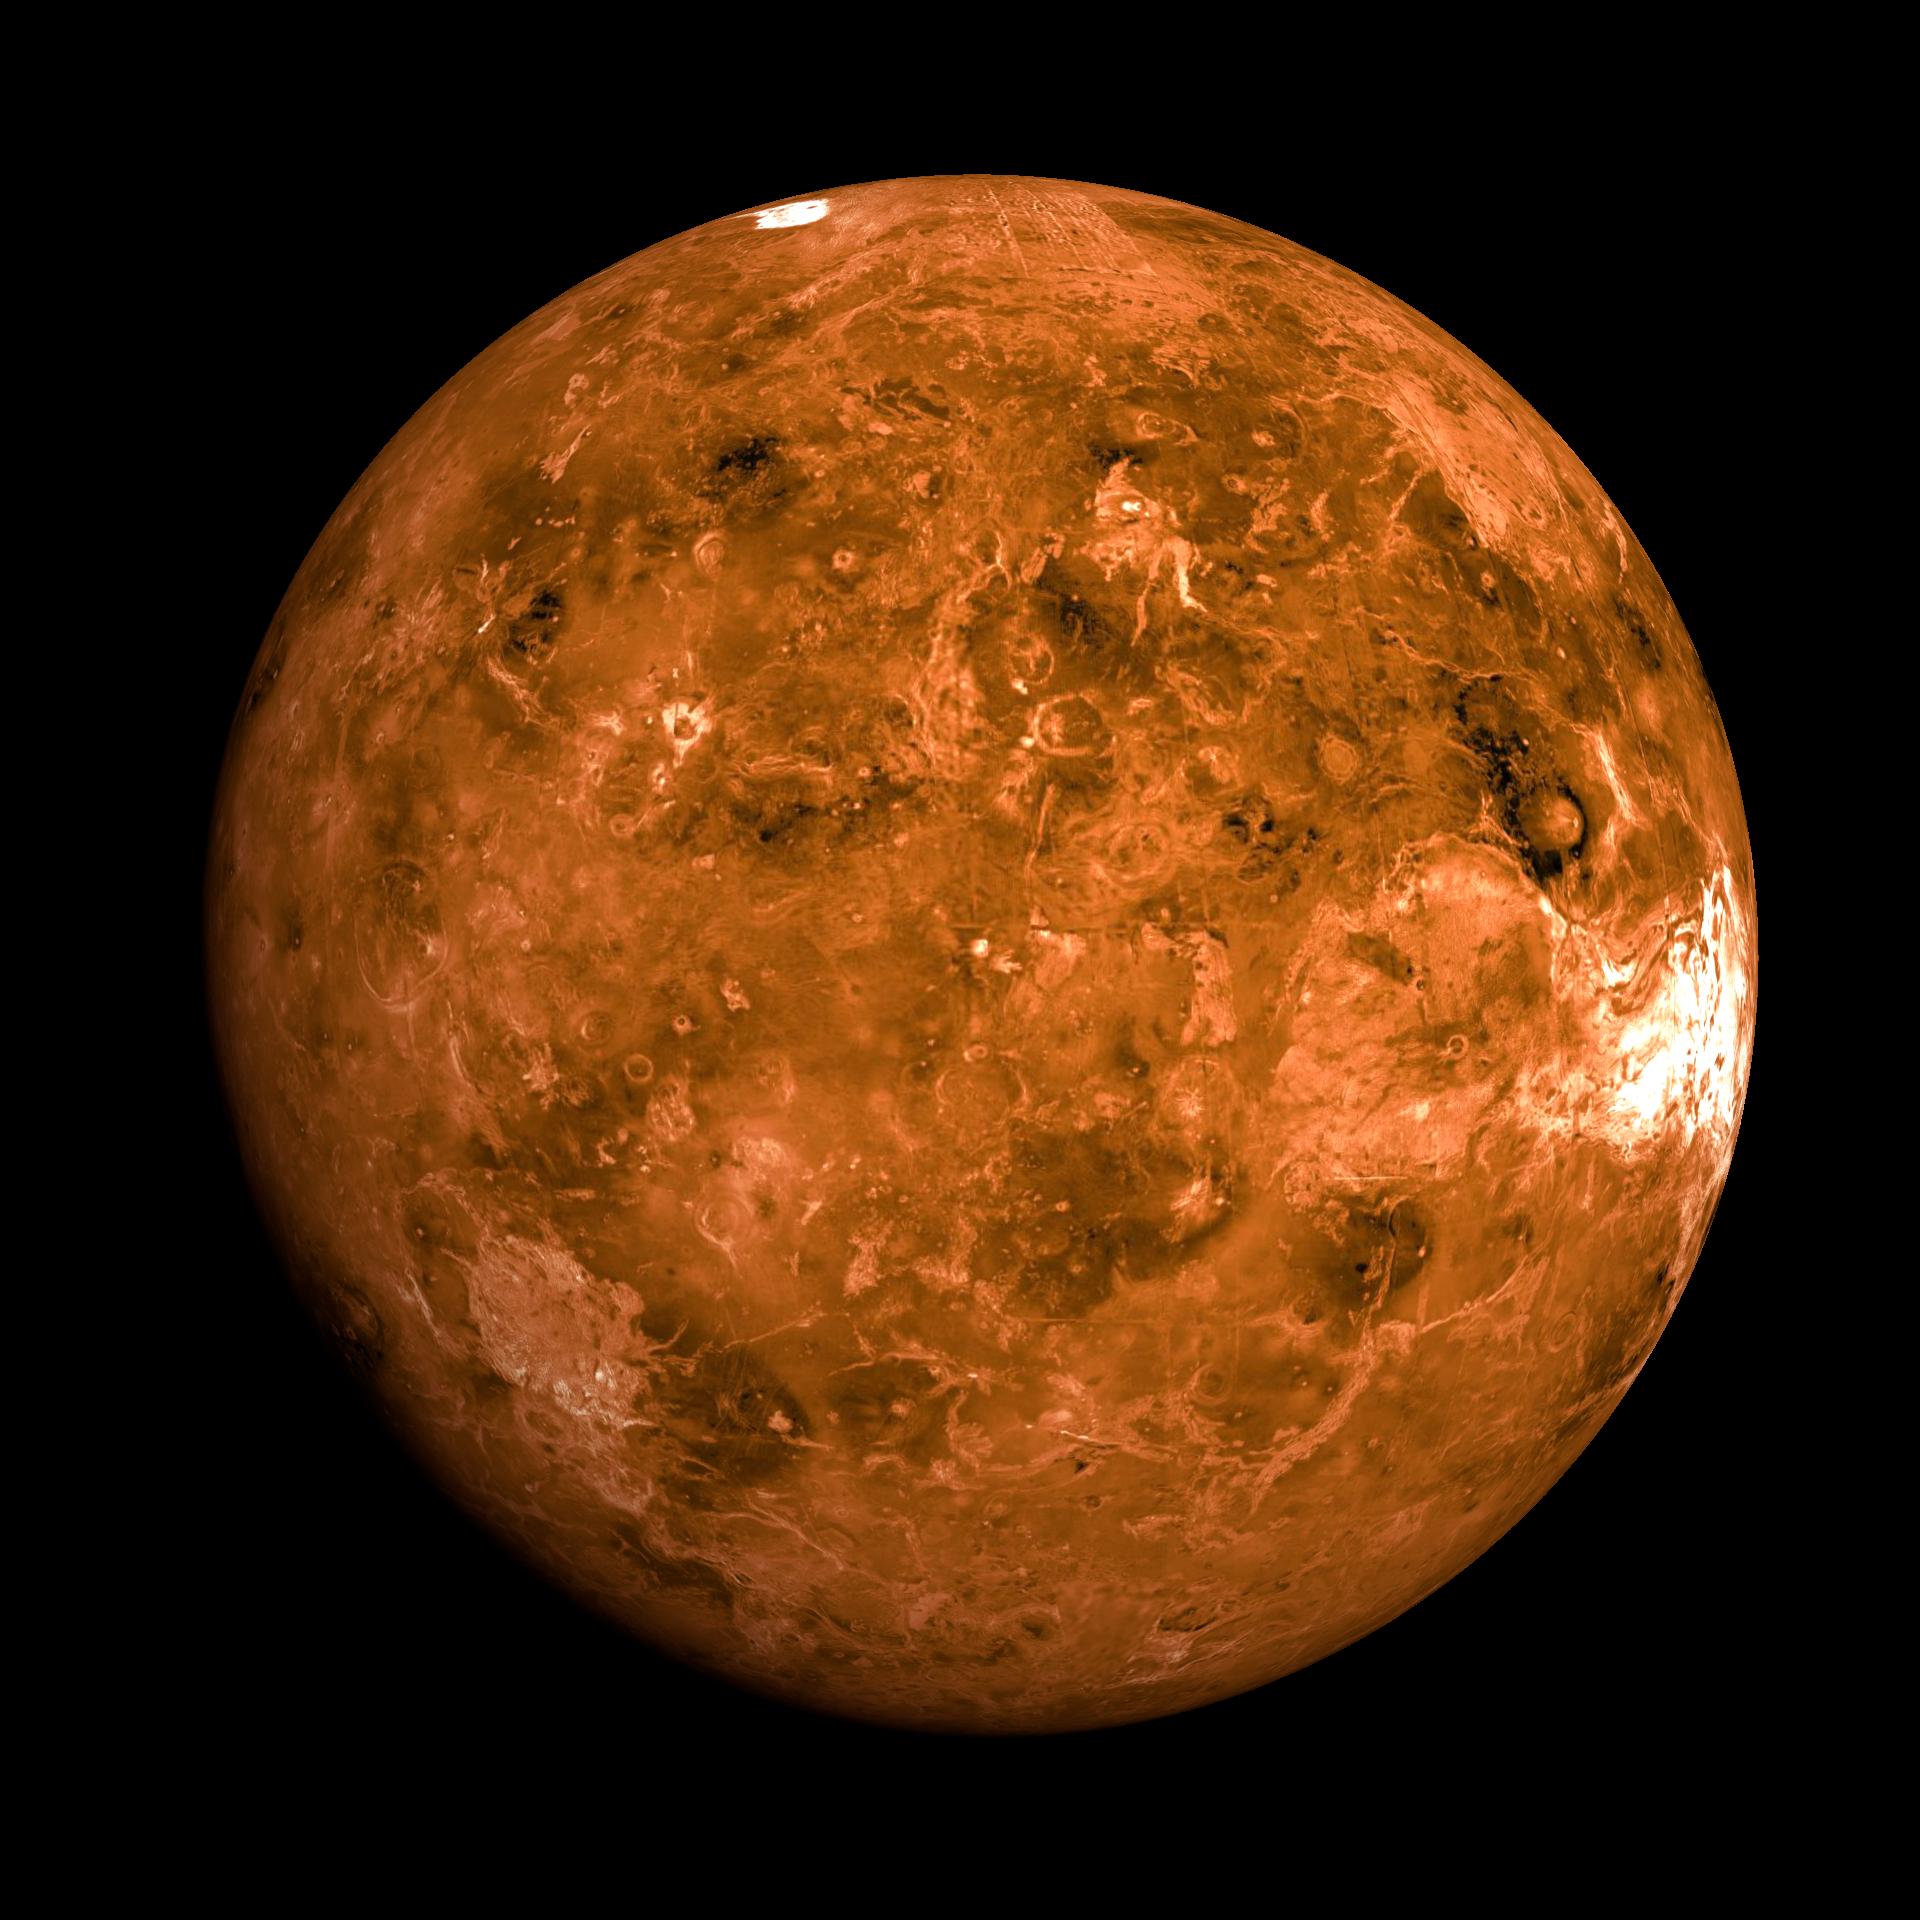 Planet transparent background